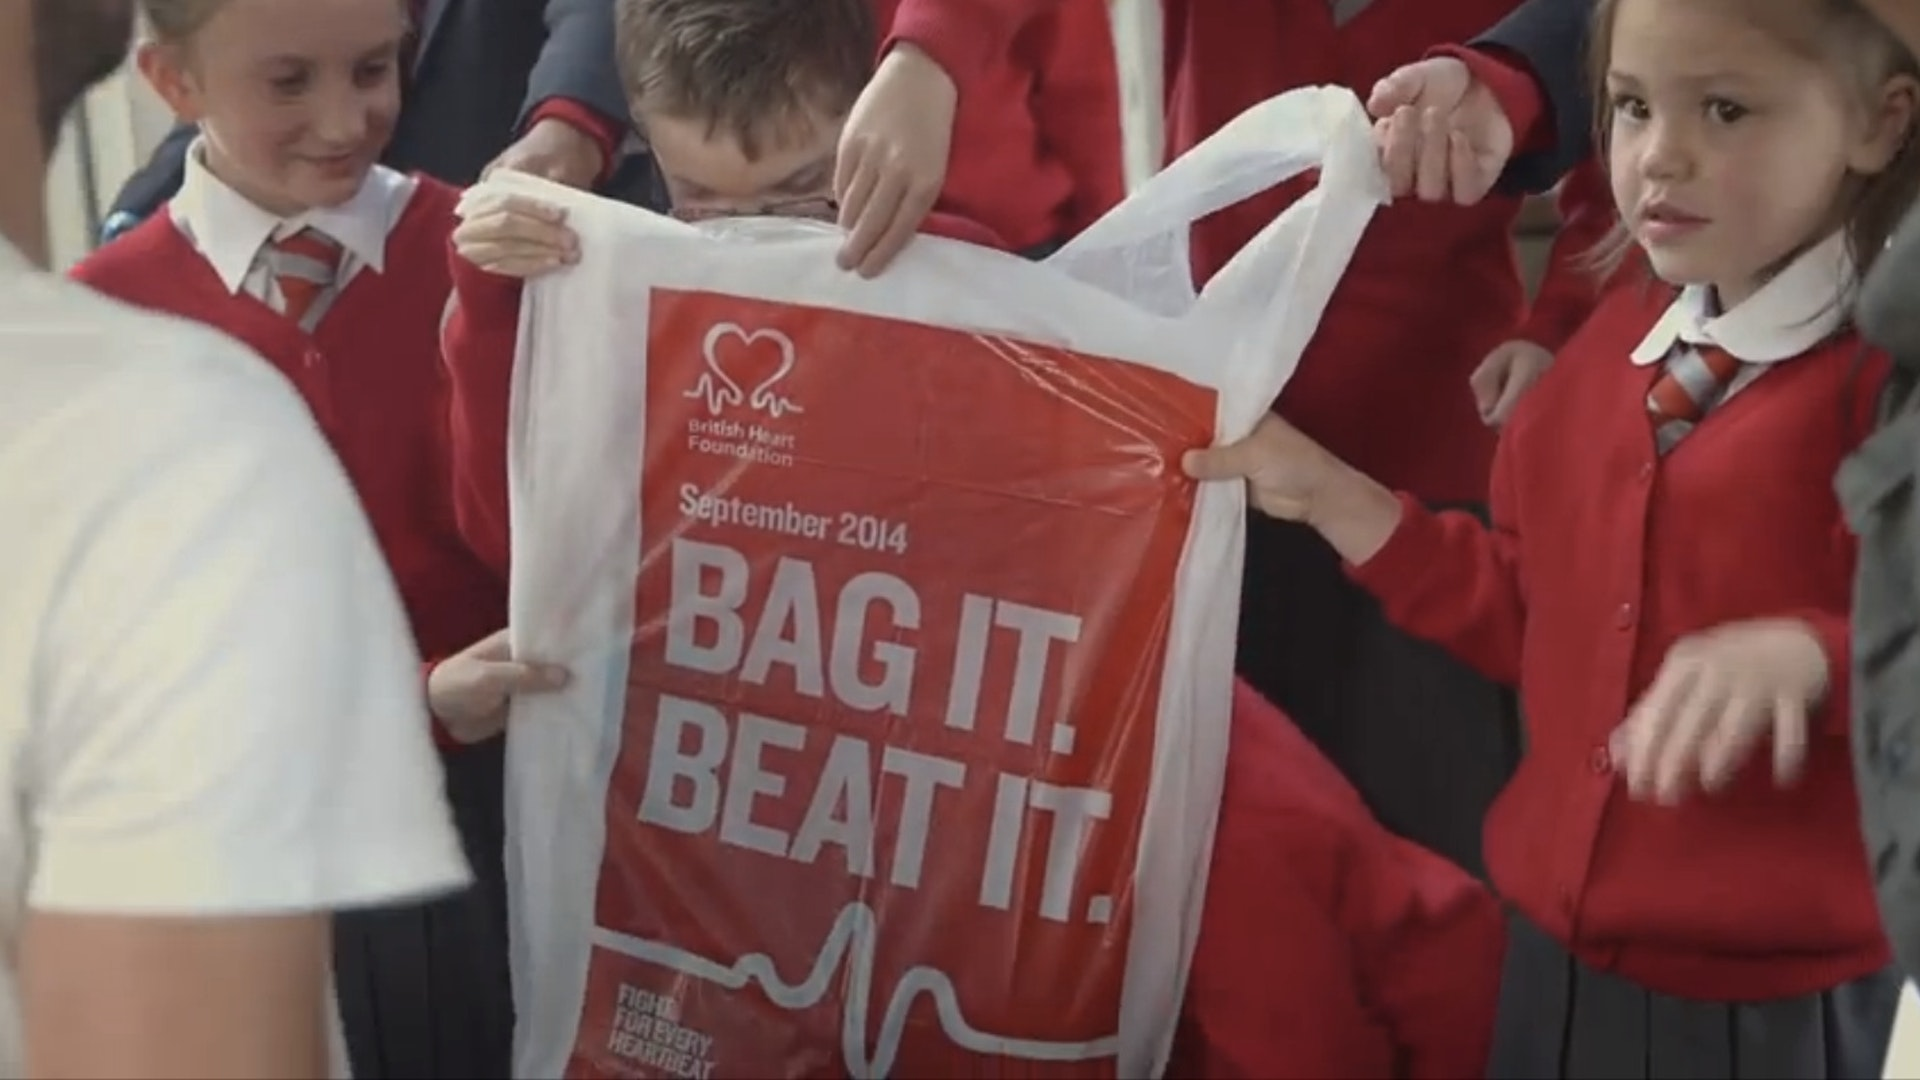 "British Heart Foundation ""Bag it, beat it"""